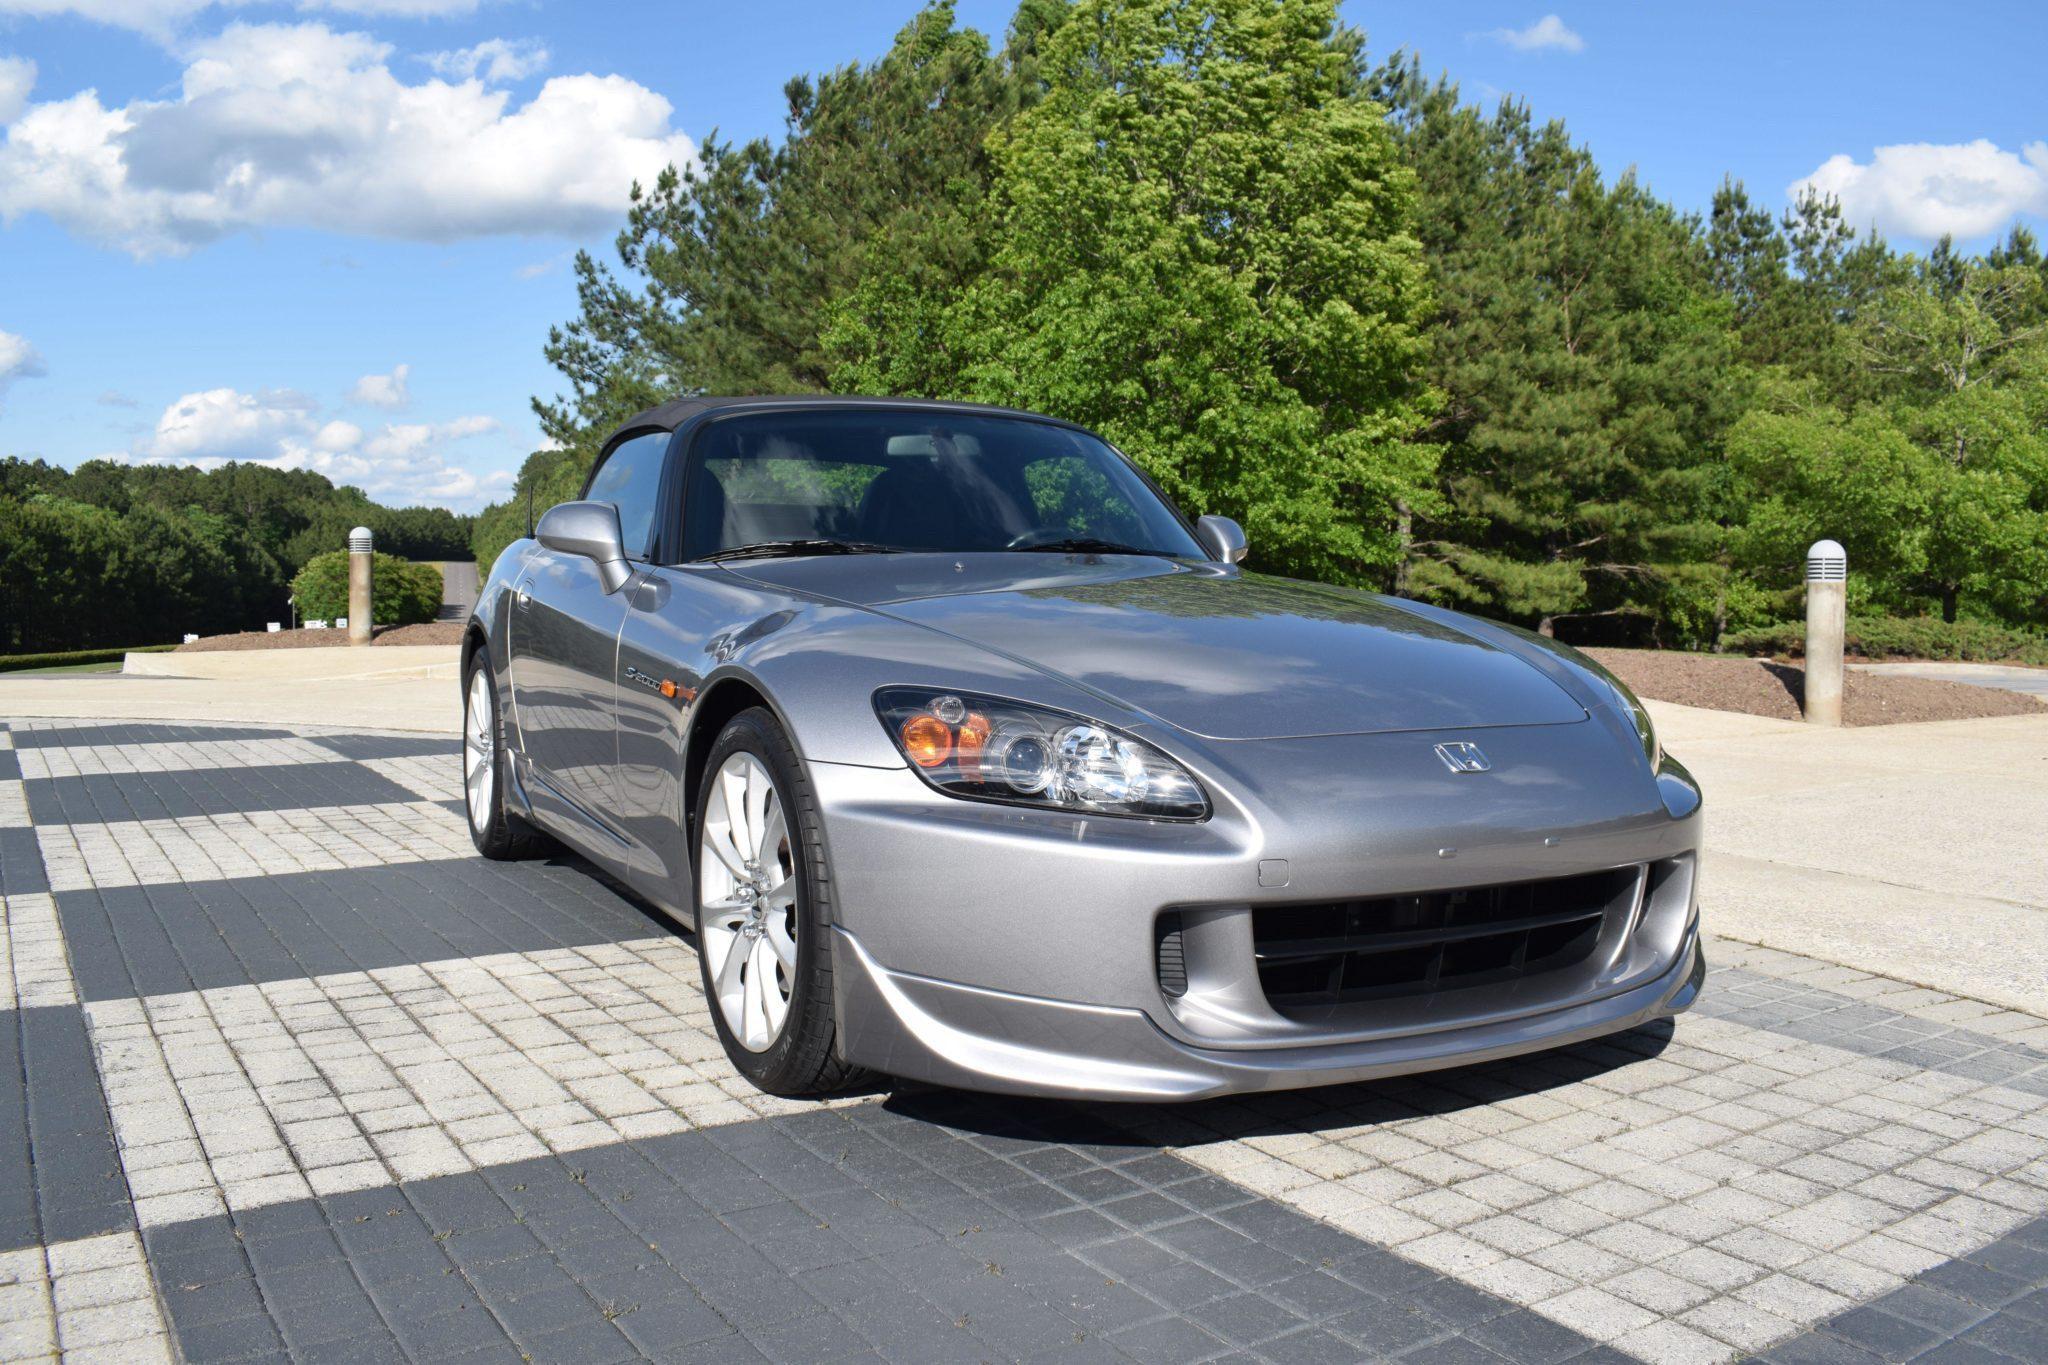 2007_Honda_S2000_sale_0004